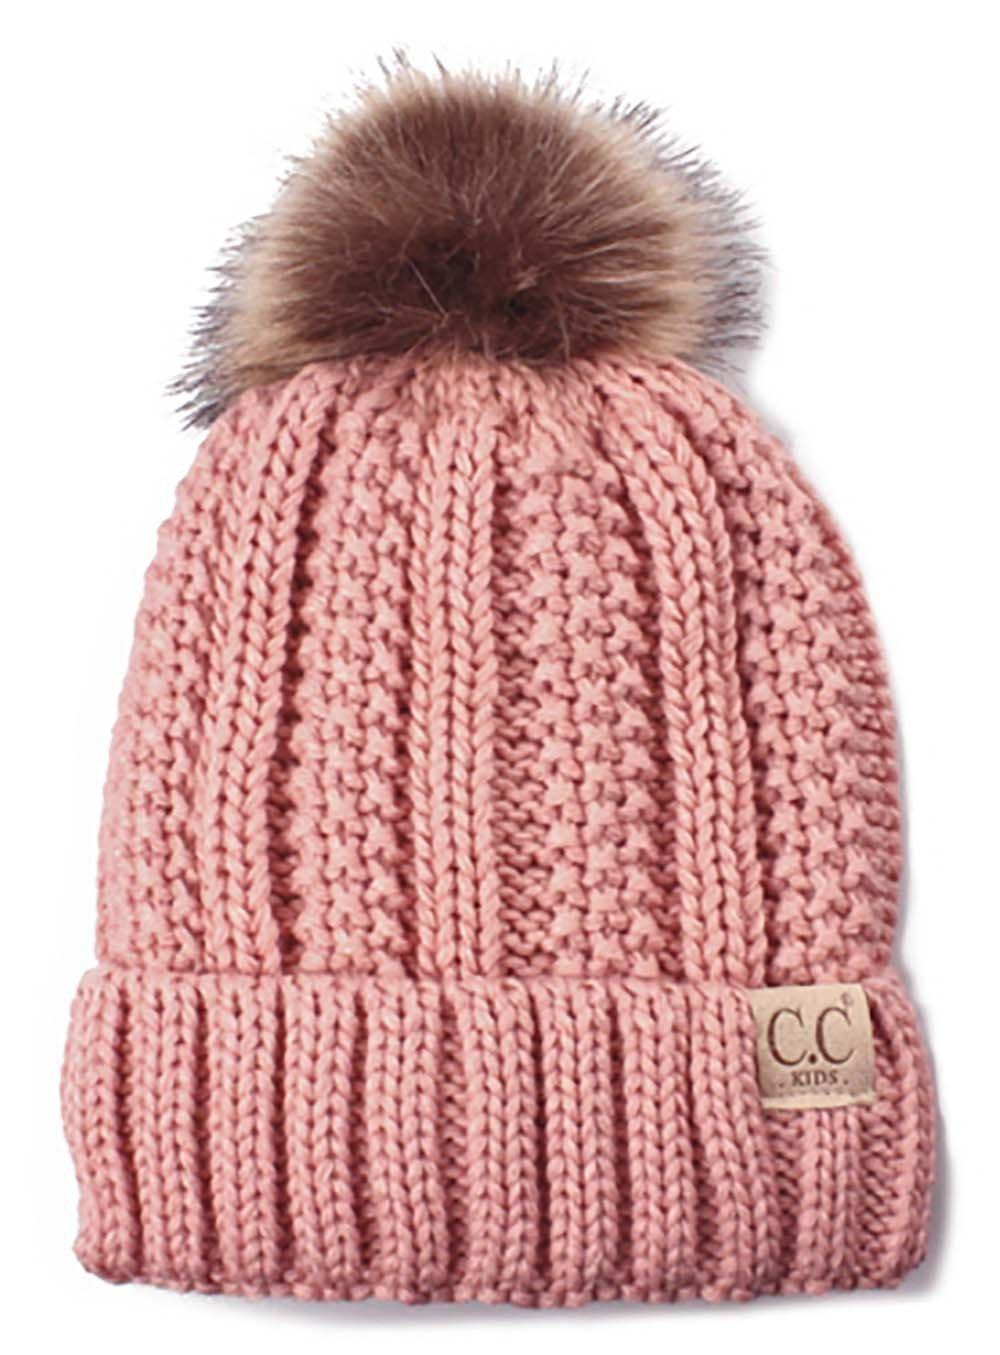 H-1820kids-71 Fuzzy Lined Pom Hat - Indi Pink